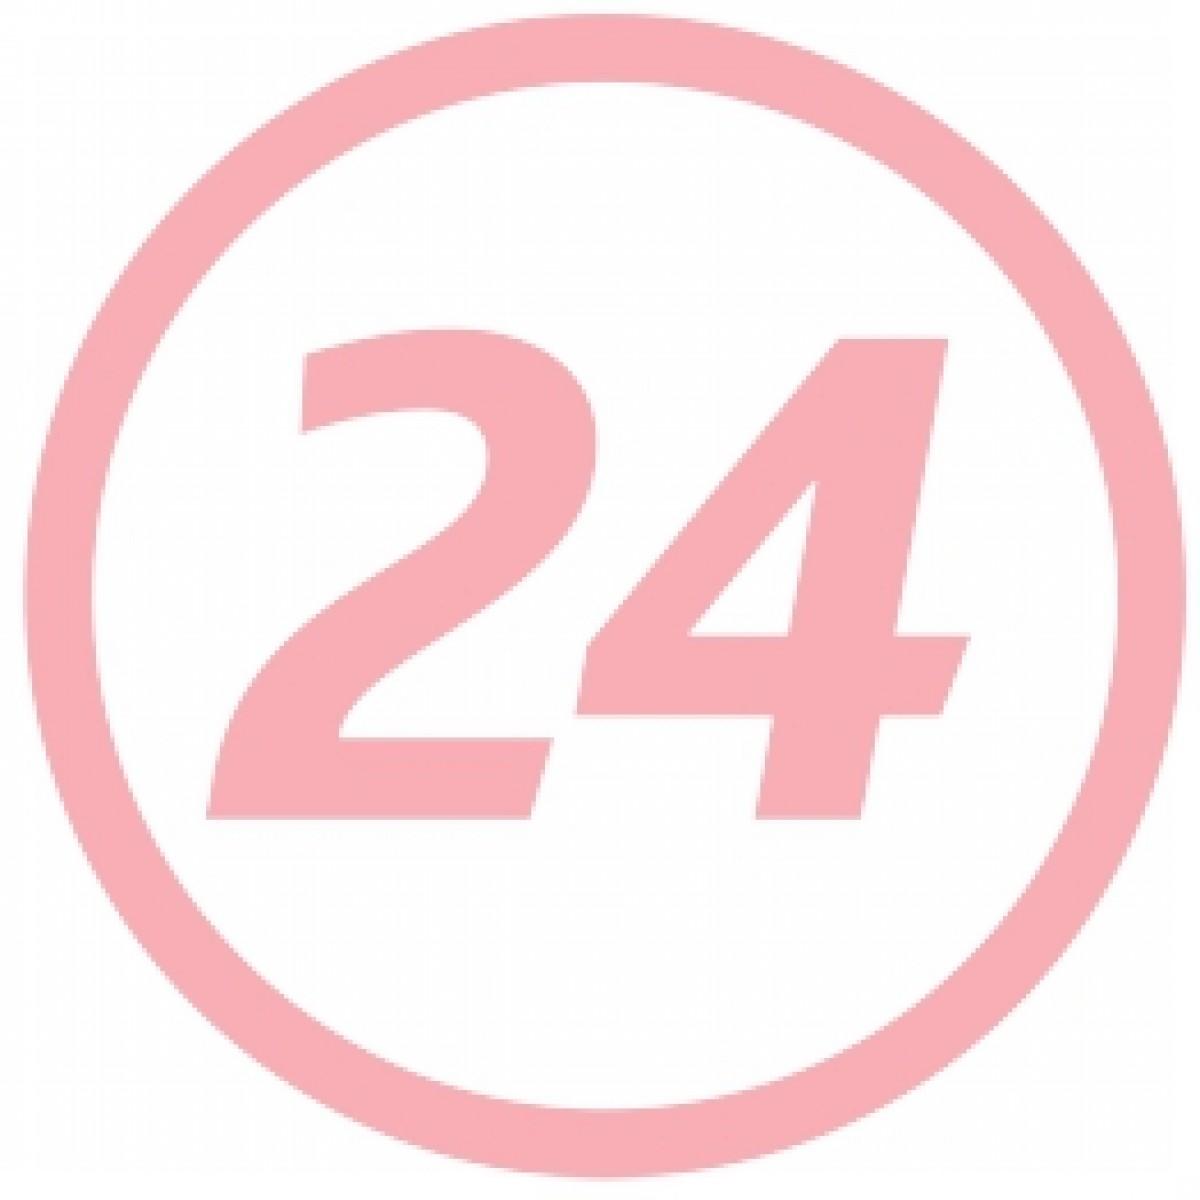 VICHY Dercos Aminexil Clinical Femei 5ml x 21 fiole, Solutie, 21buc